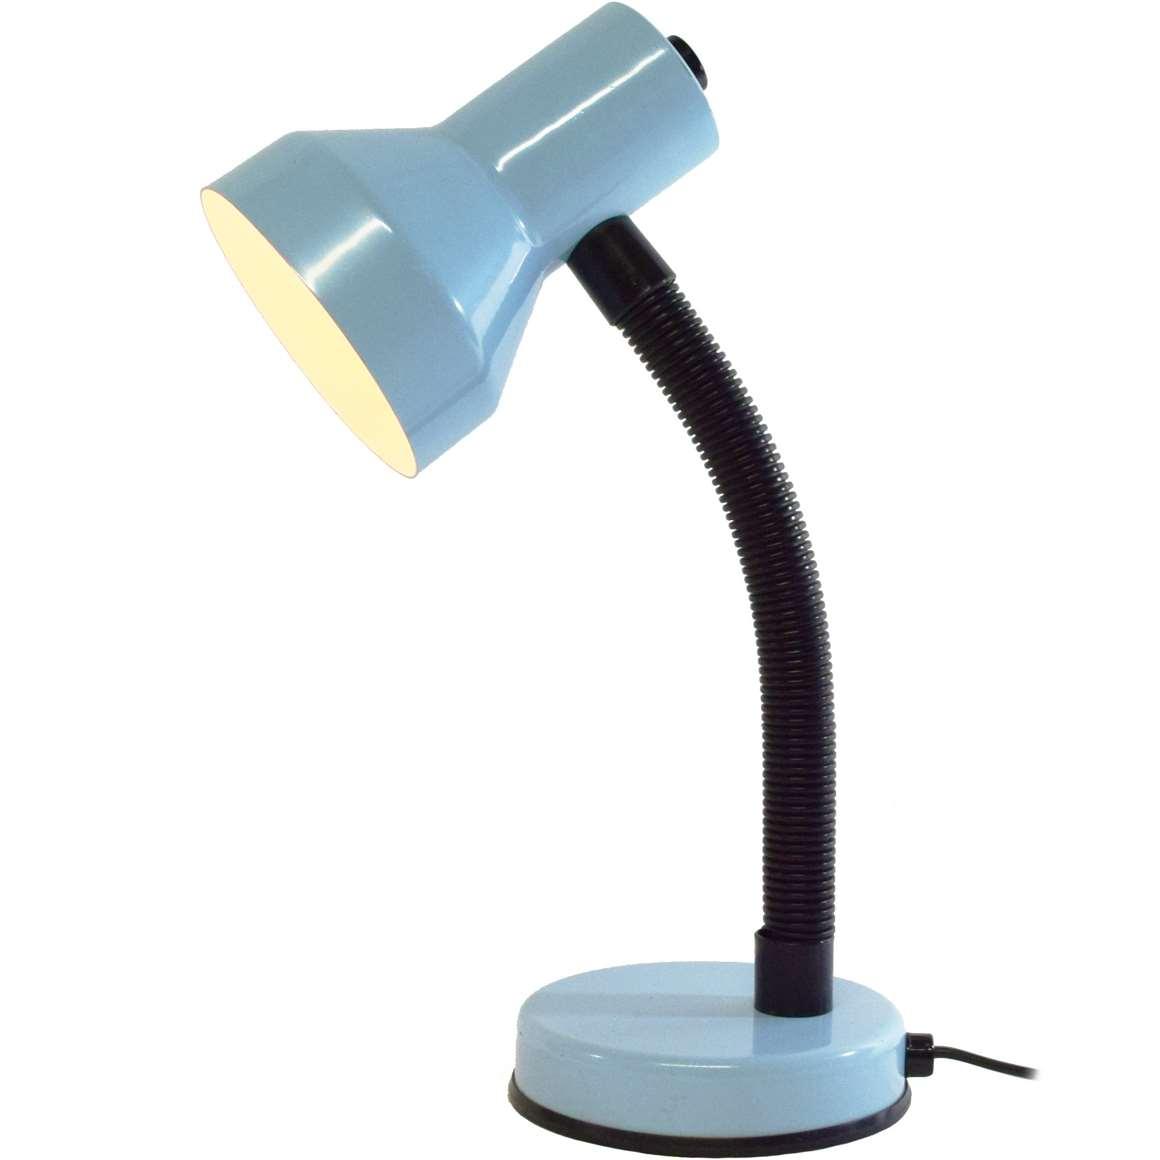 Veneta Lumi Gooseneck Desk Lamp light blue painted round base black gooseneck light blue lampshade 1980s